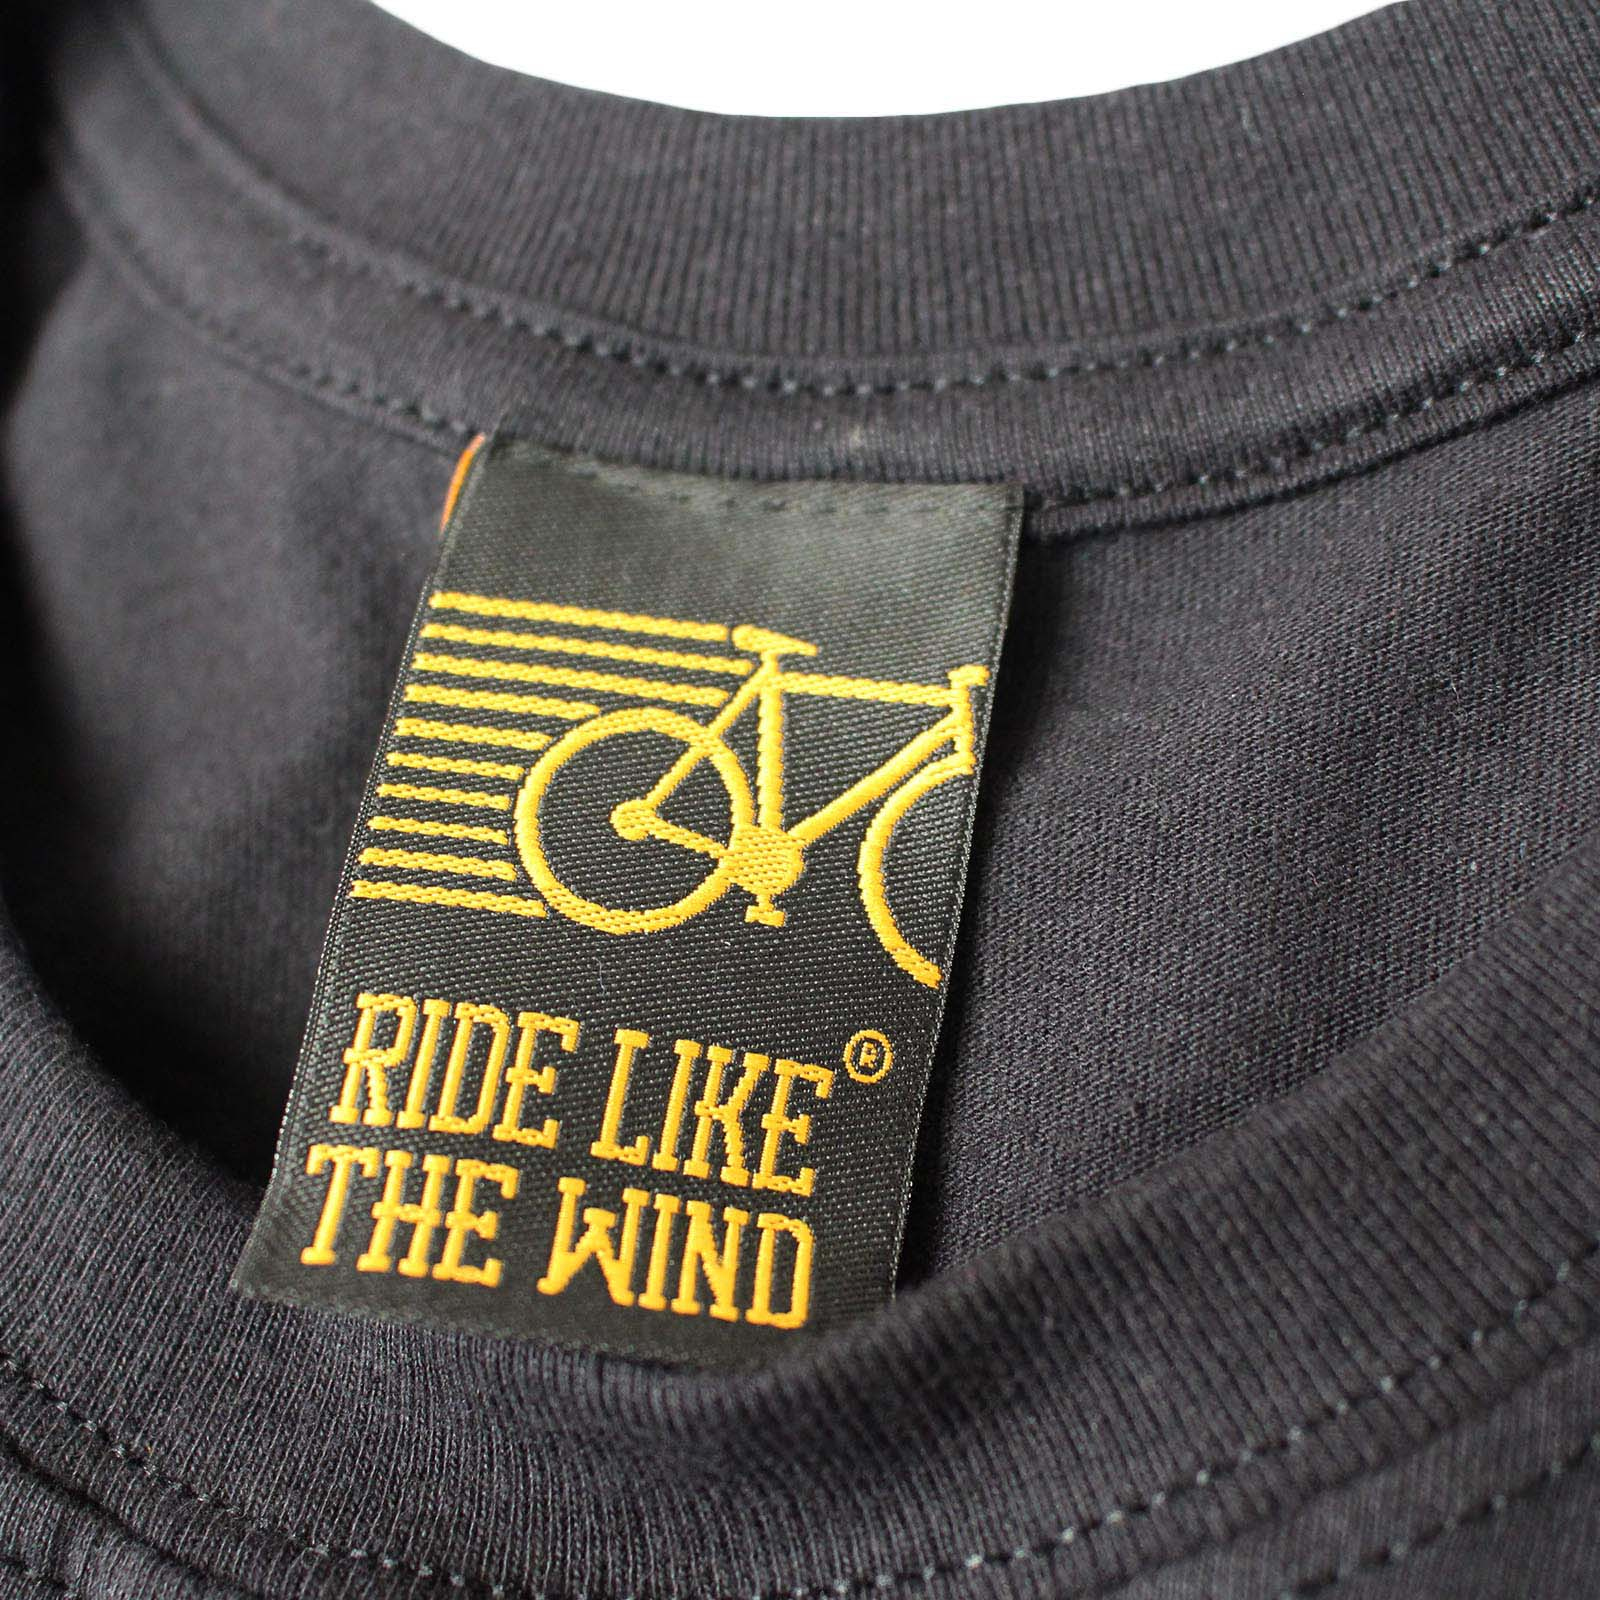 Cycling-T-Shirt-Funny-Novelty-Mens-tee-TShirt-Bike-Part-Words thumbnail 4